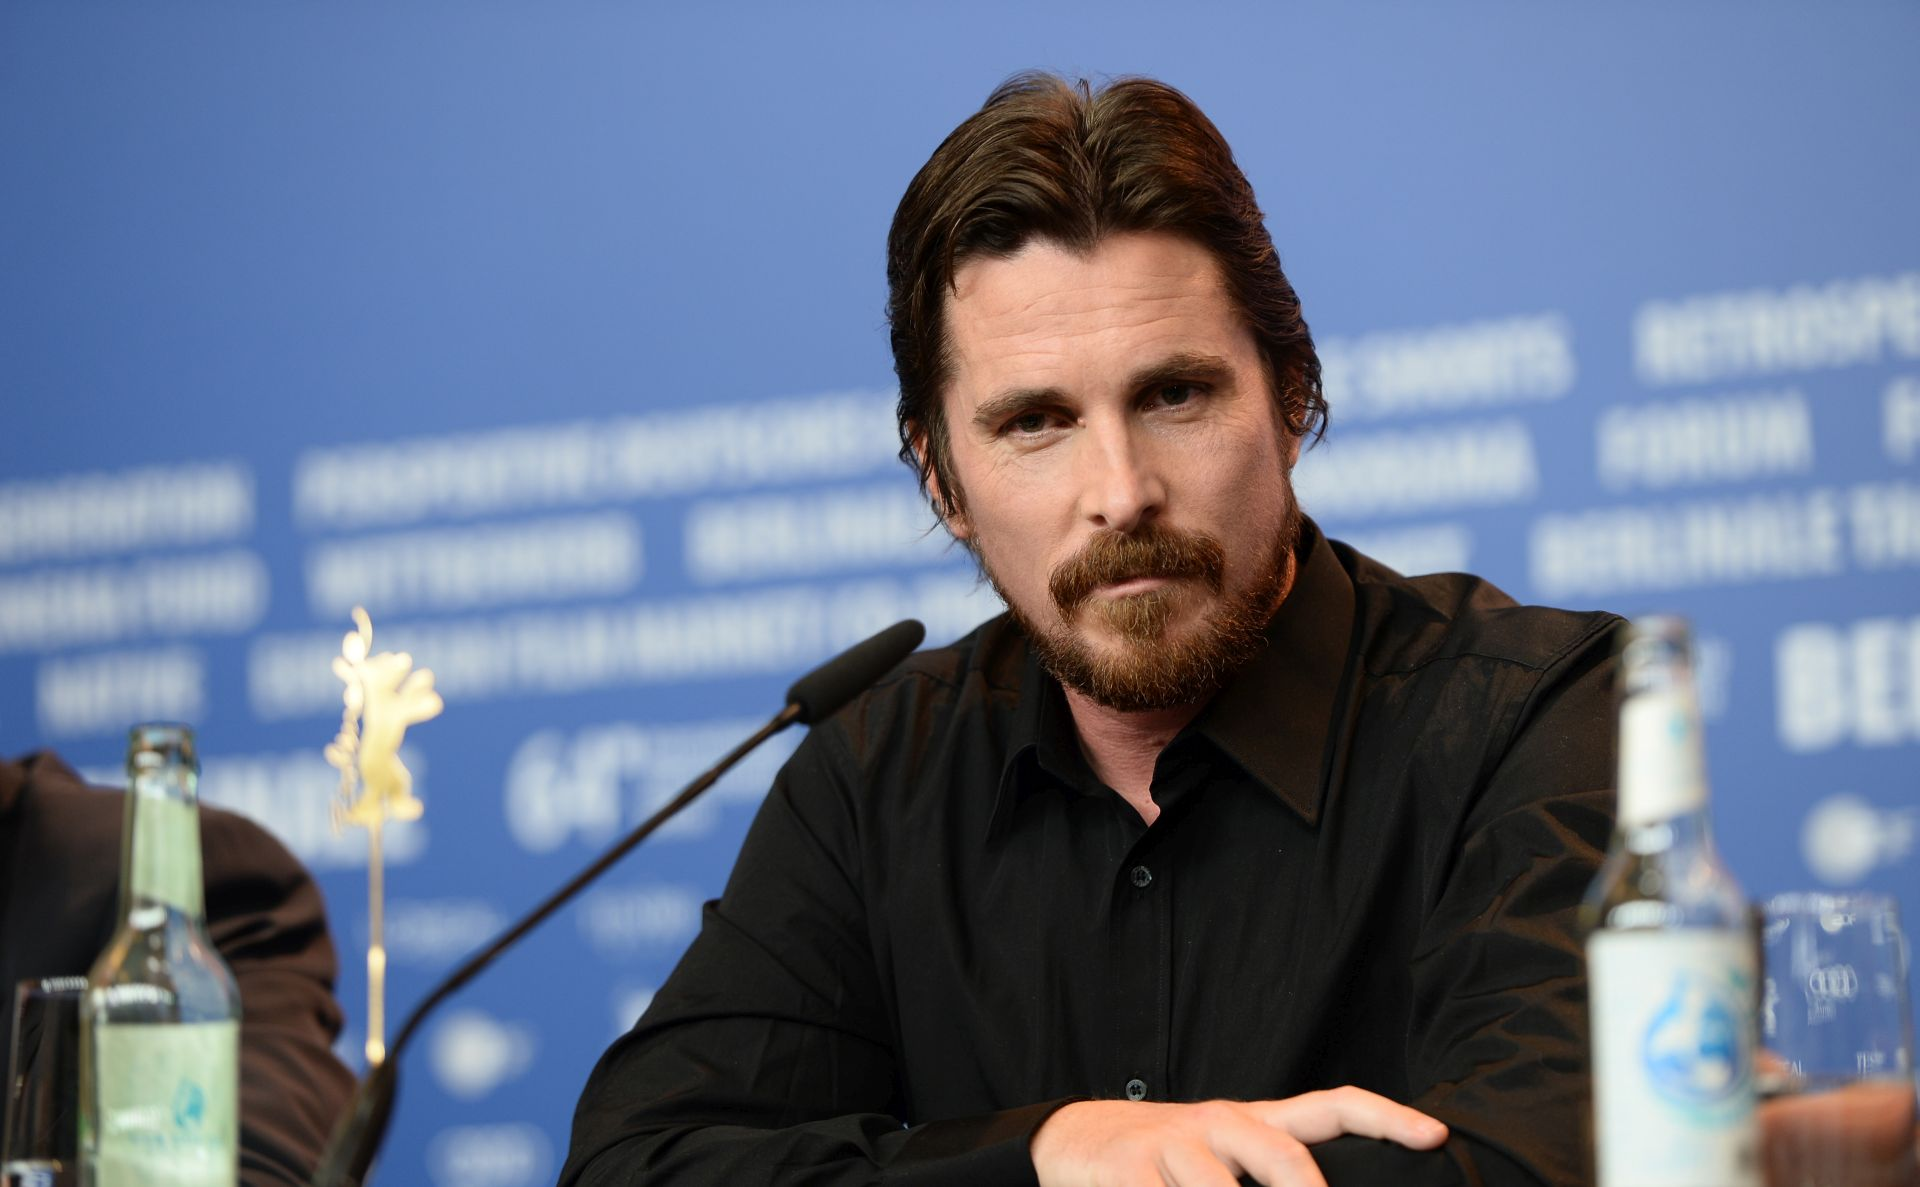 LUKSUZNI TALIJANSKI AUTOMOBIL Christian Bale u još neimenovanom filmu o Enzu Ferrariju